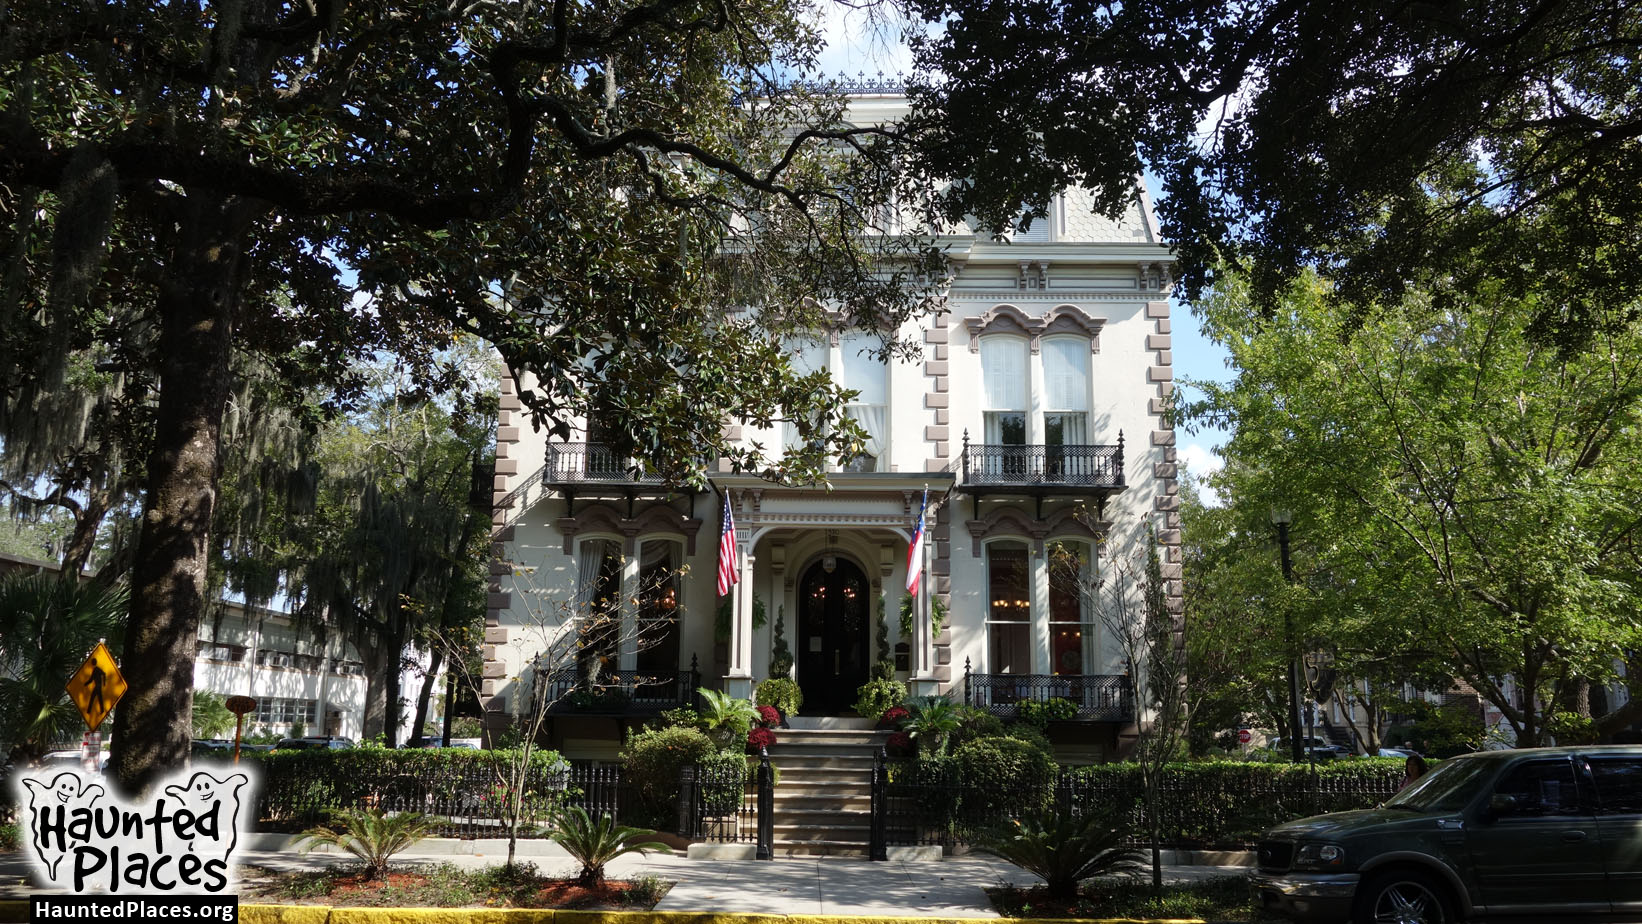 Hamilton Turner Inn Haunted Places Savannah Ga 31401